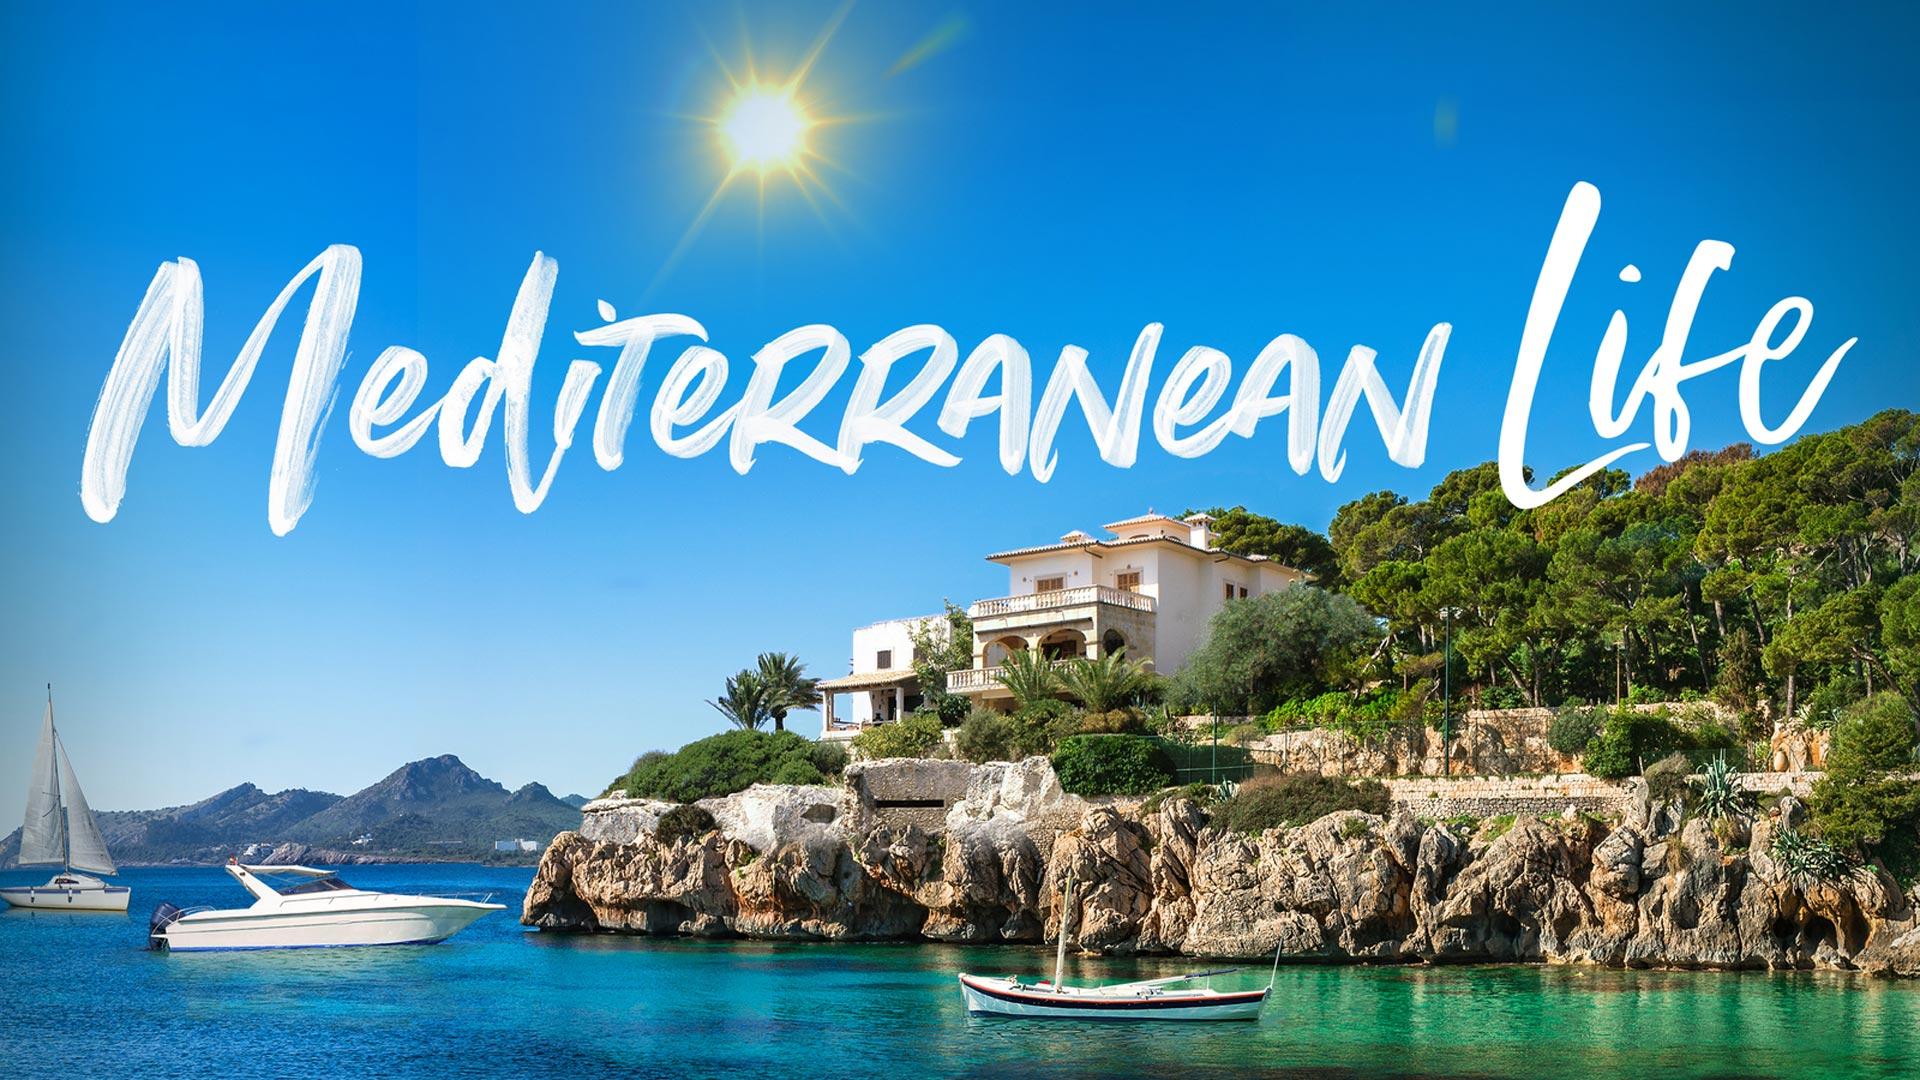 Mediterranean Life - Season 1